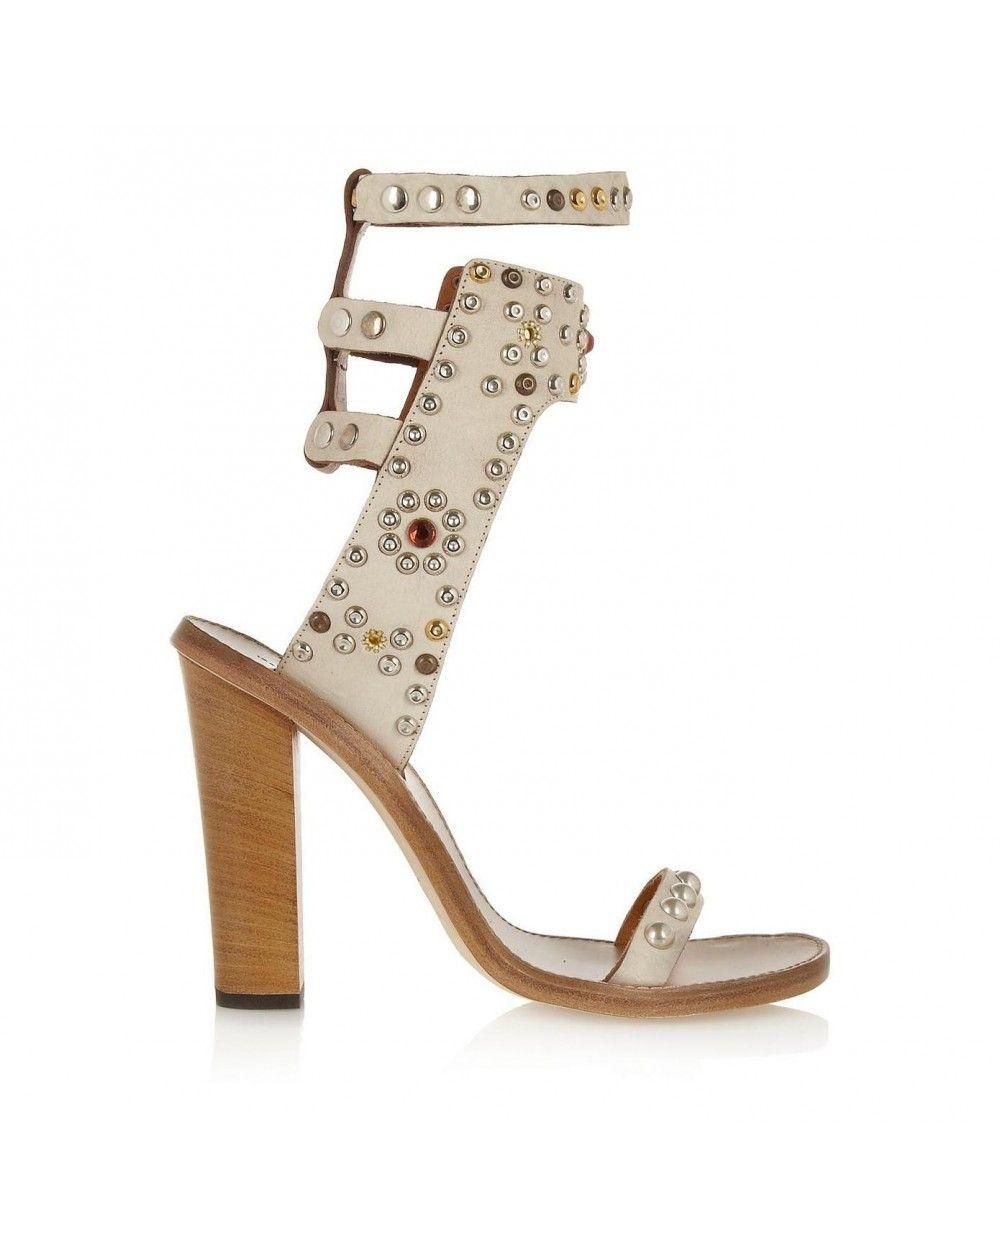 eb894586f83 Sale Isabel Marant Carol Studded Leather Sandals Shoes Online ...